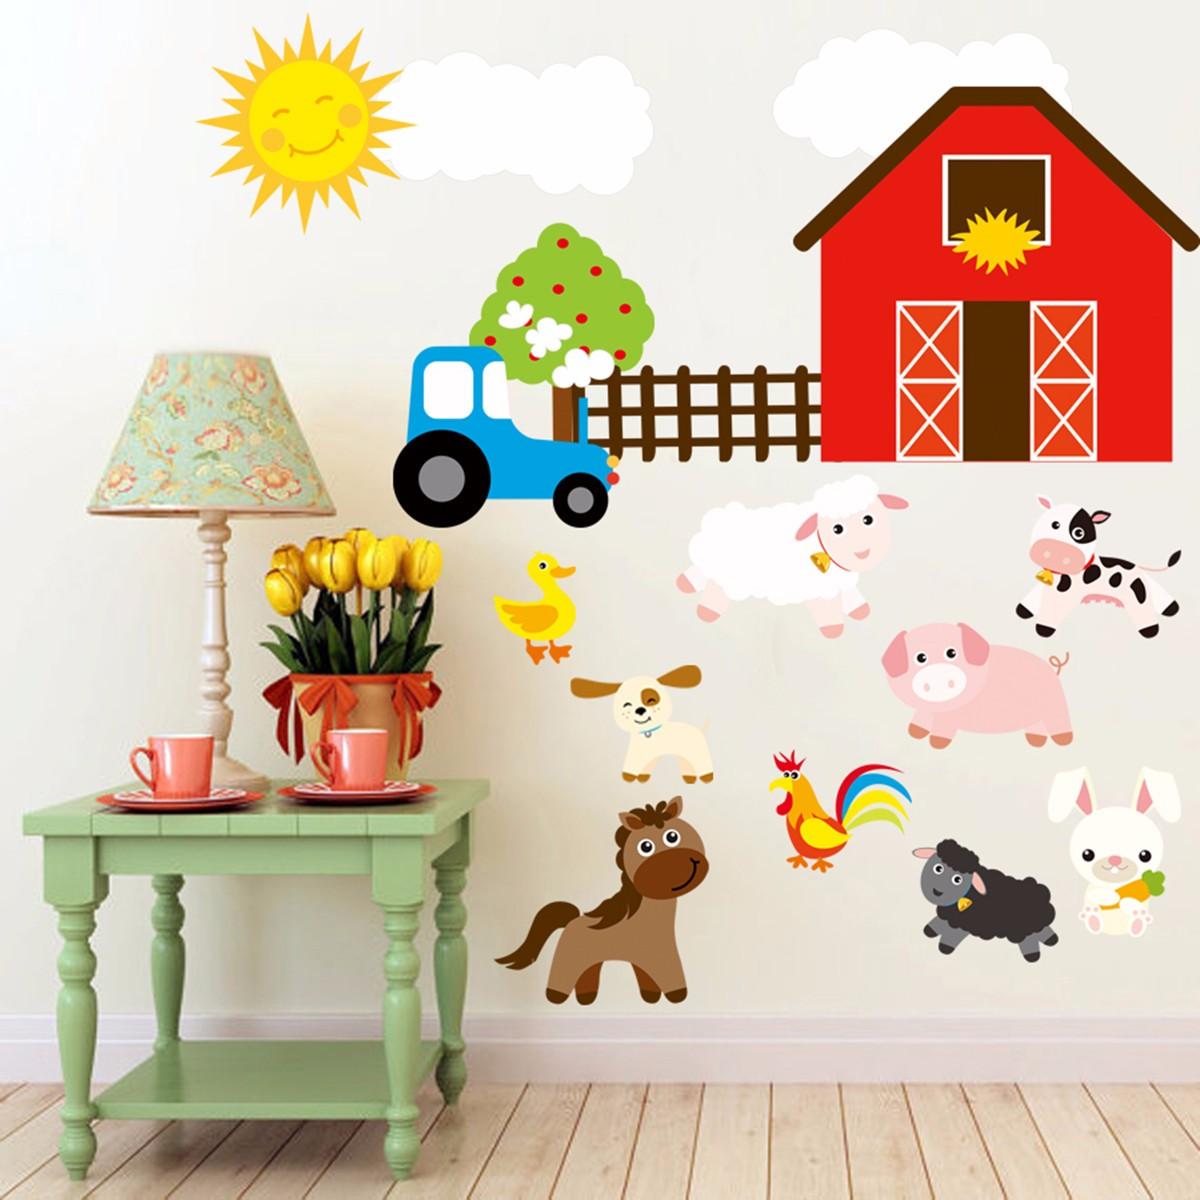 Kids Room Wall Decals Farm Wall Decals Farm Animal Decals: Popular Farm Furniture-Buy Cheap Farm Furniture Lots From